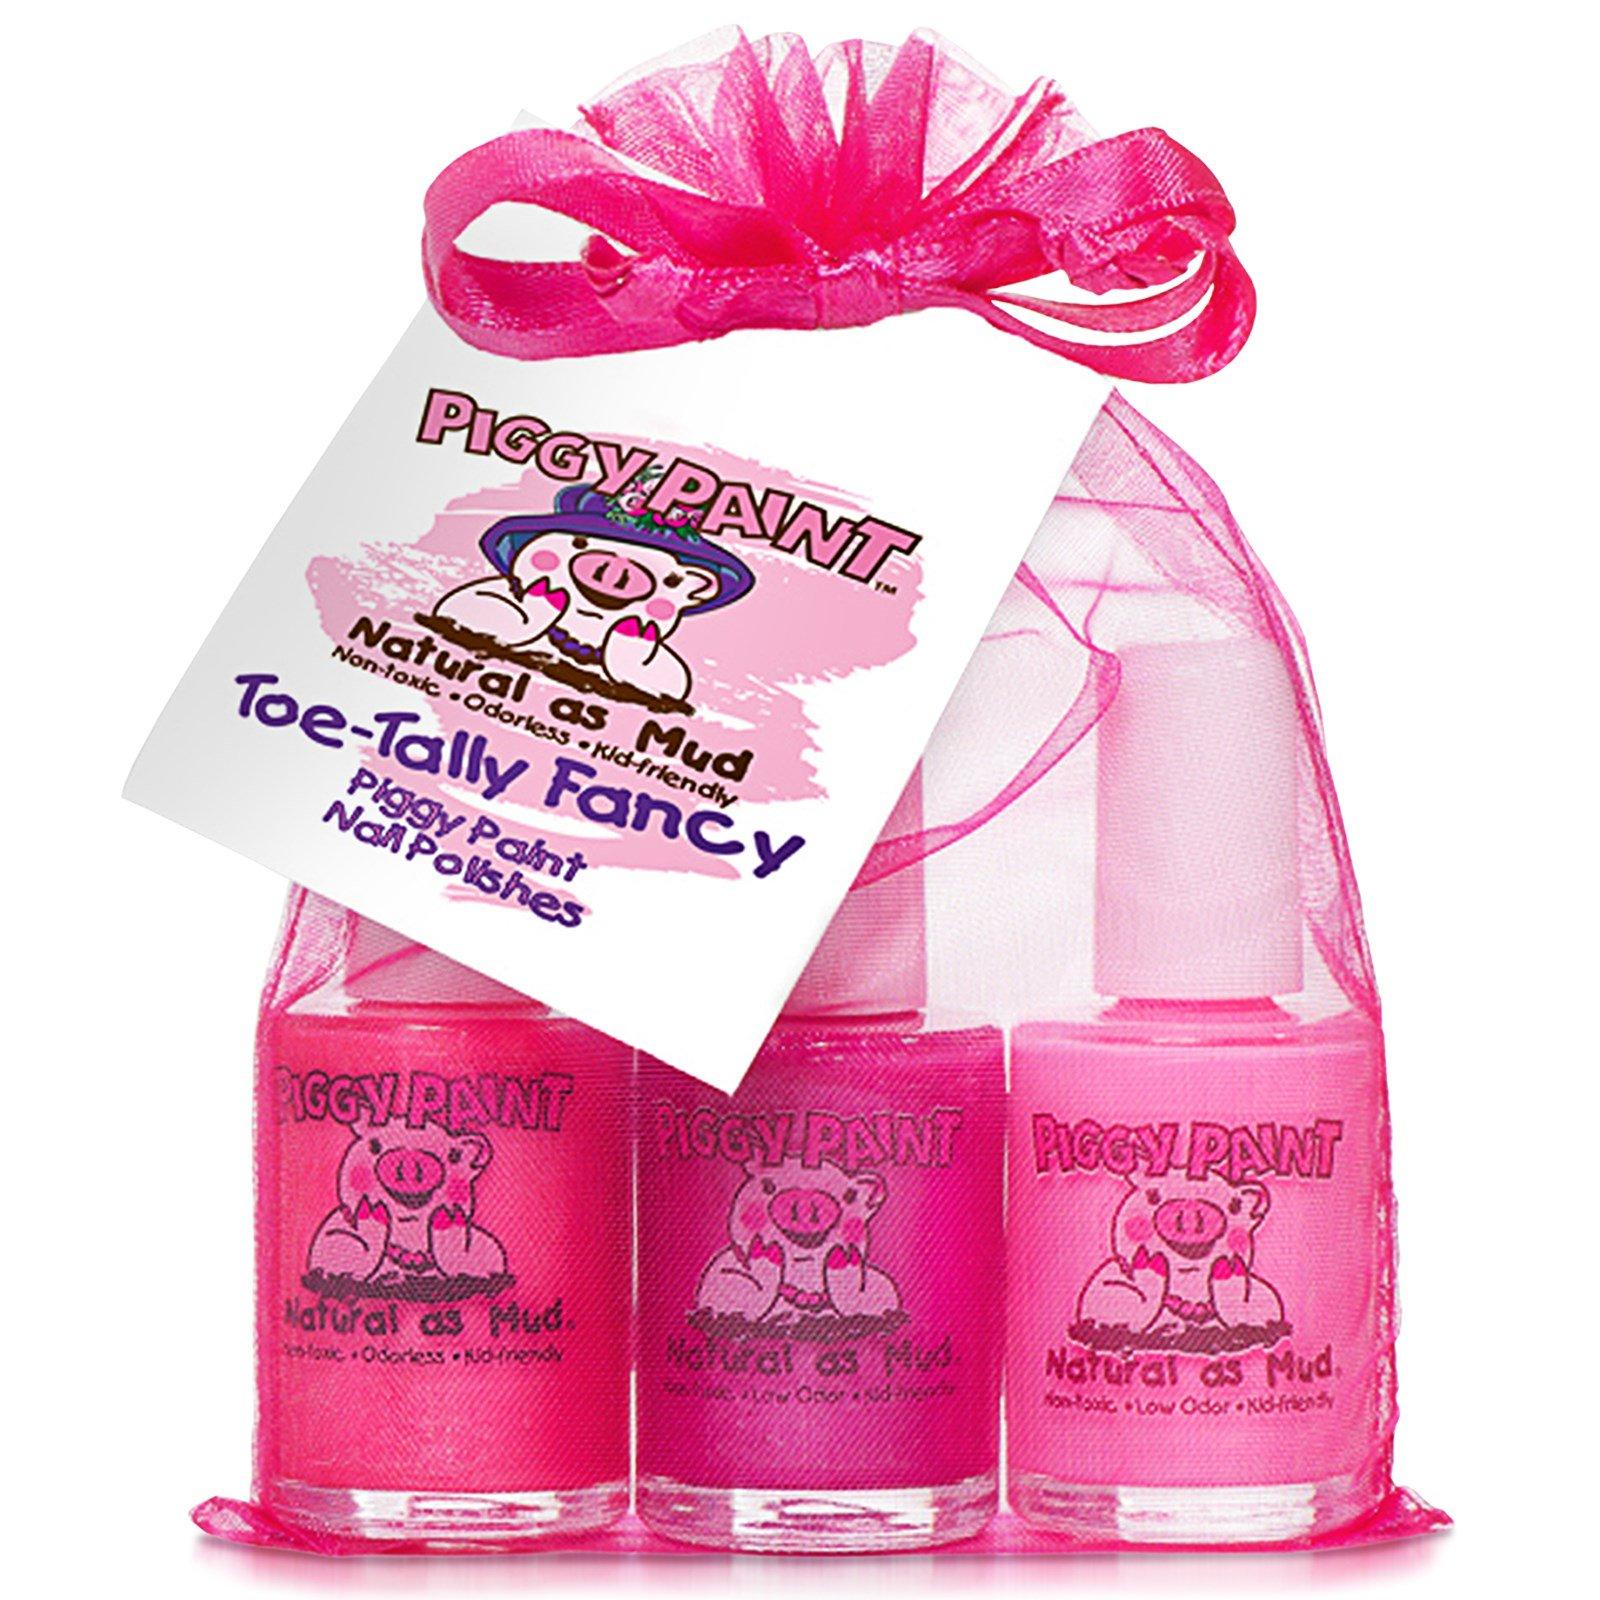 Piggy Paint, Nail Polishes, Toe-Tally Fancy, 3 Bottles, 0.5 fl oz (15 ml) Each